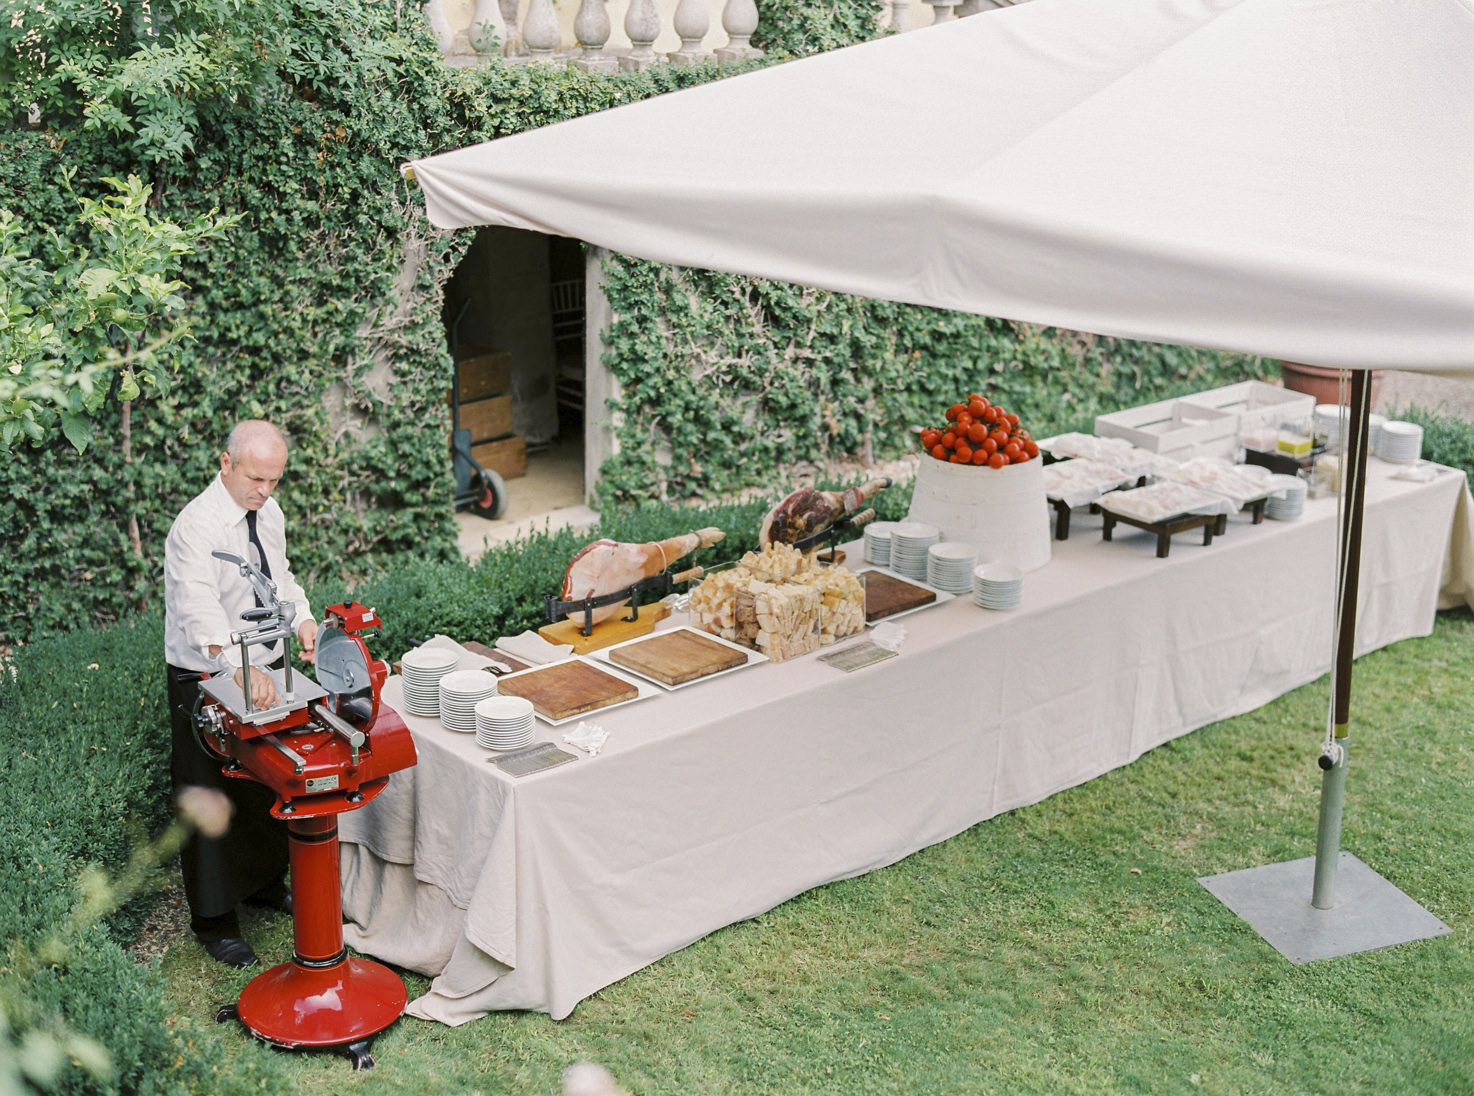 Food station for Italian aperitif